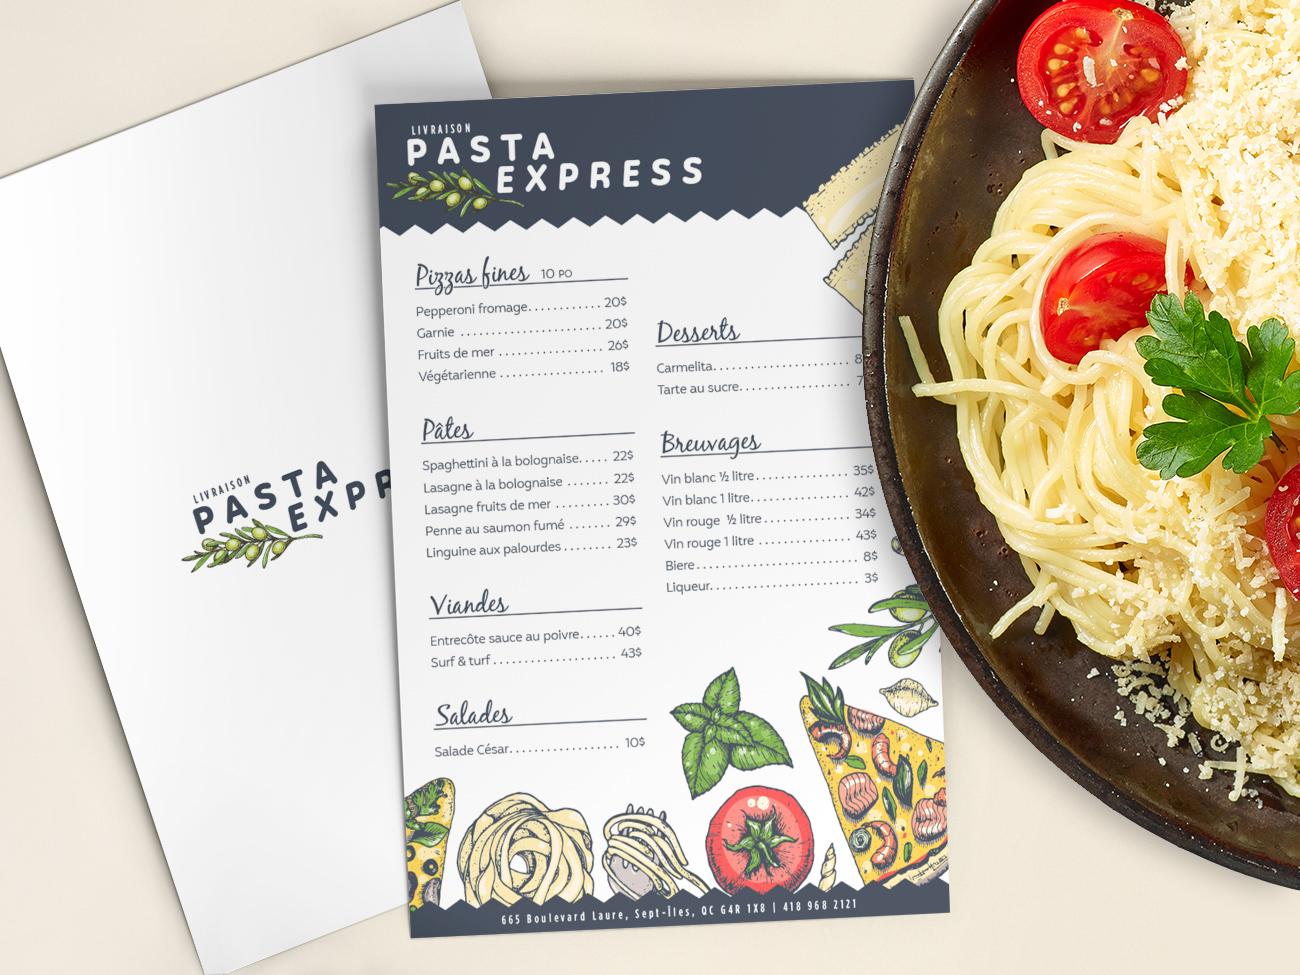 PastaExpress